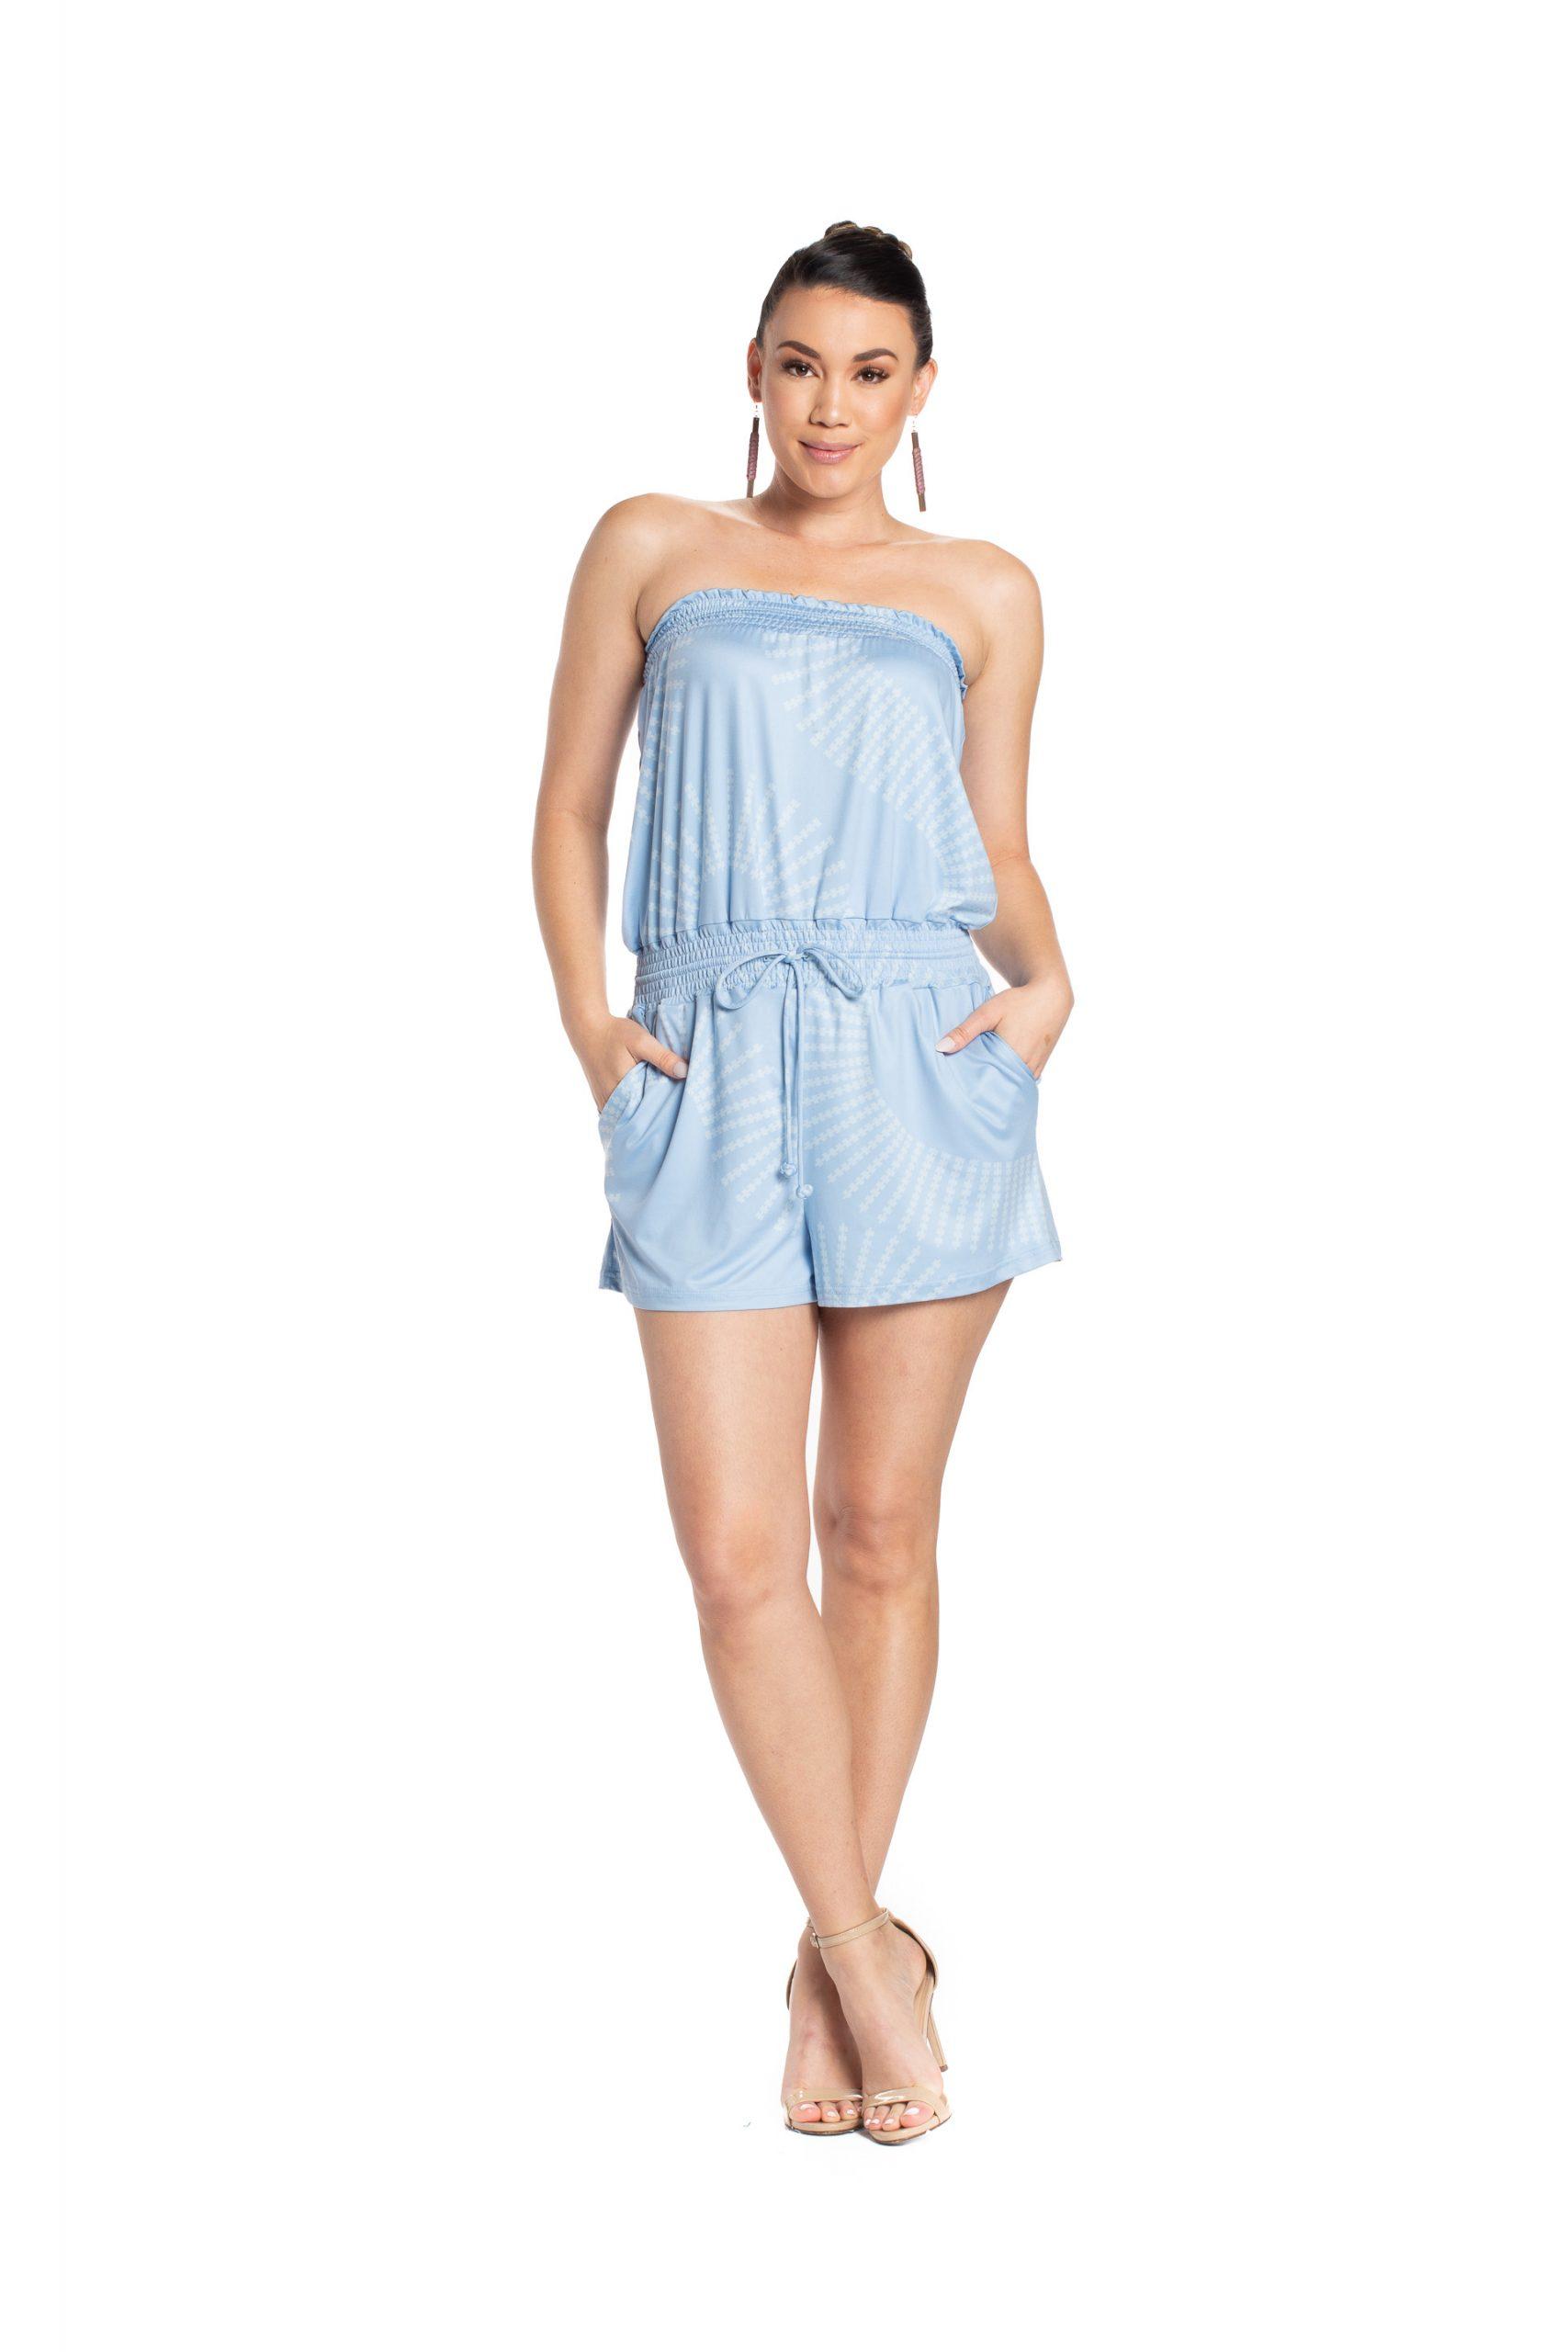 Model wearing Pakalana Romper in Pewa Celestial/Illusional Blue